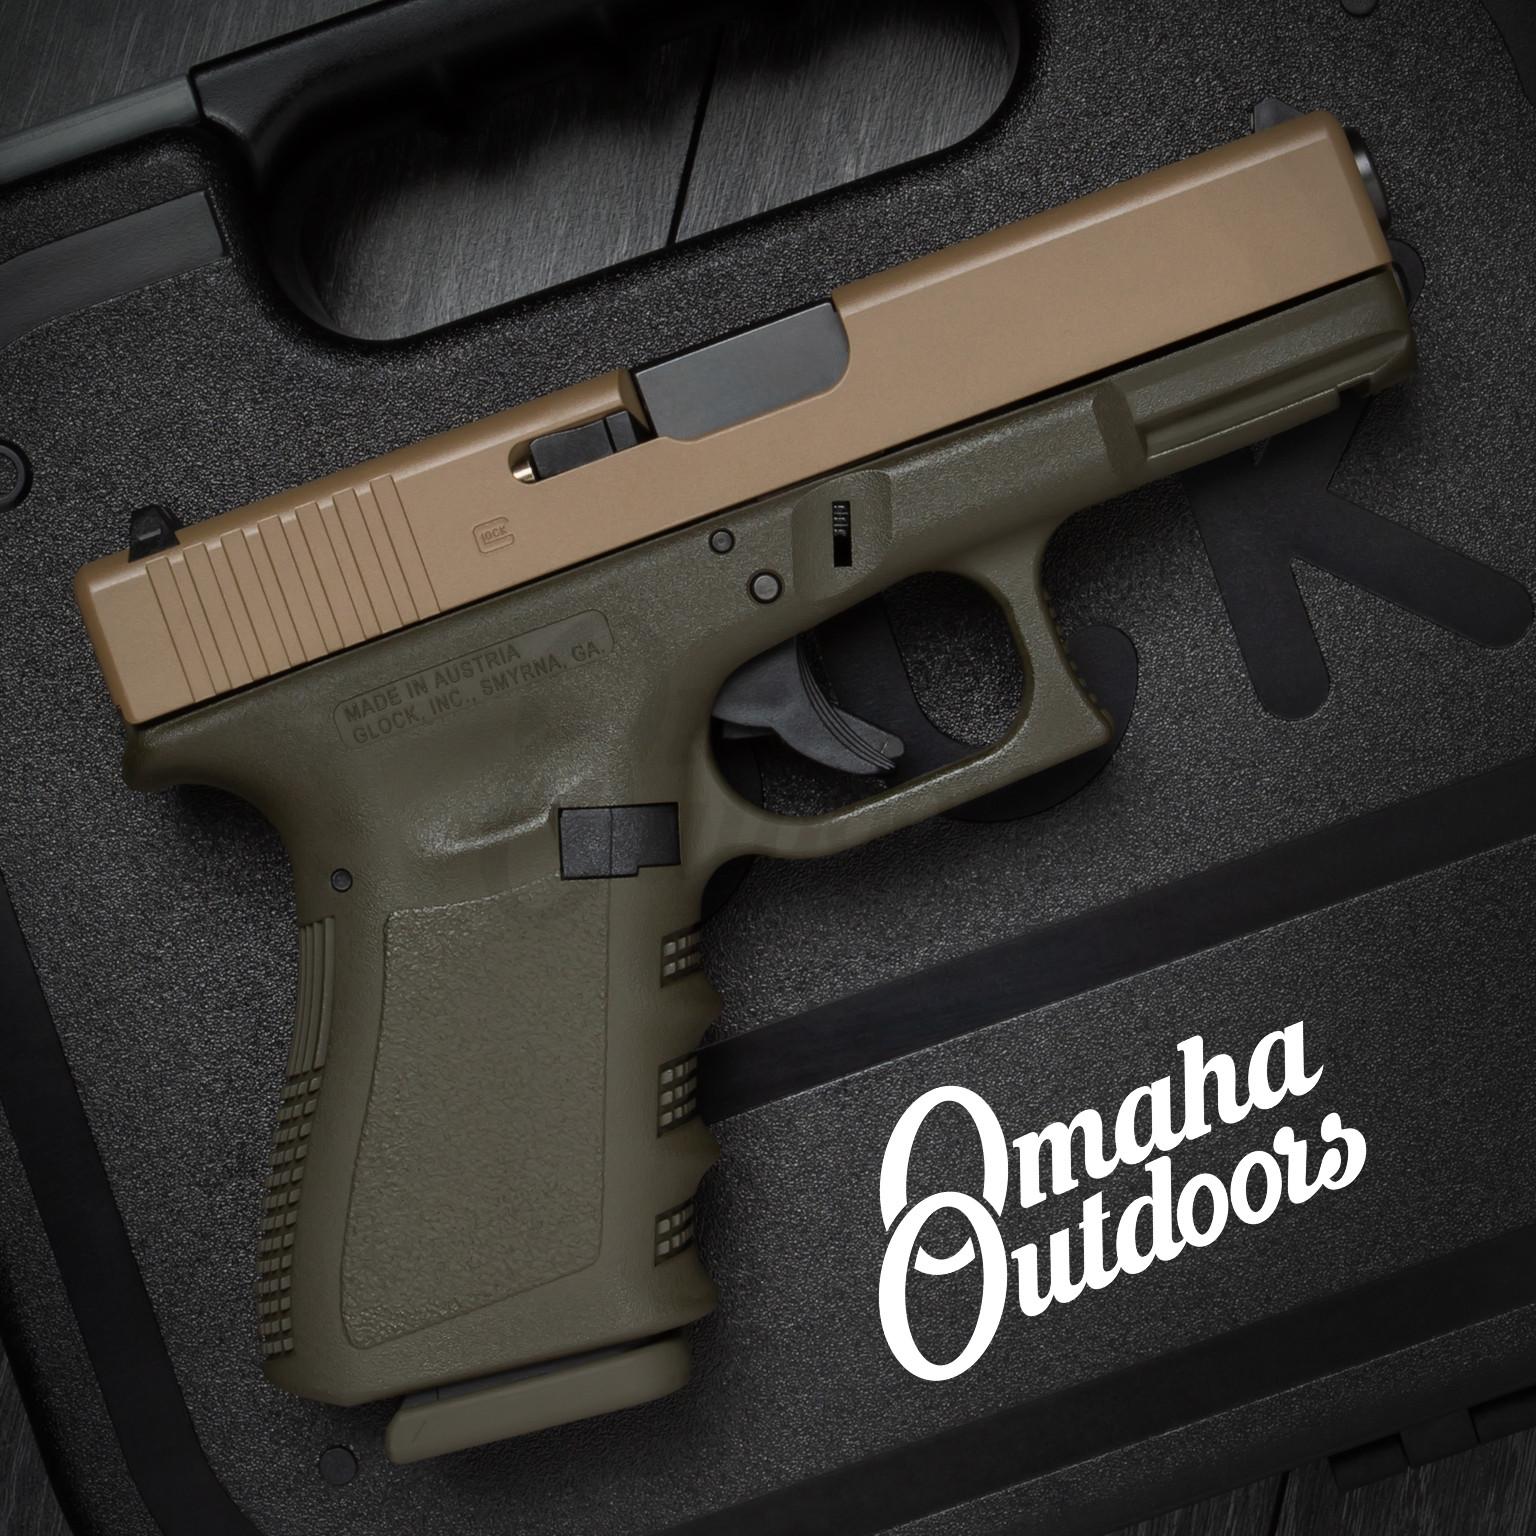 Glock 19 Gen 3 OD Green Frame Pistol FDE Slide 9mm 15 RD  PI1950203-MODG-FR-FDE-SL